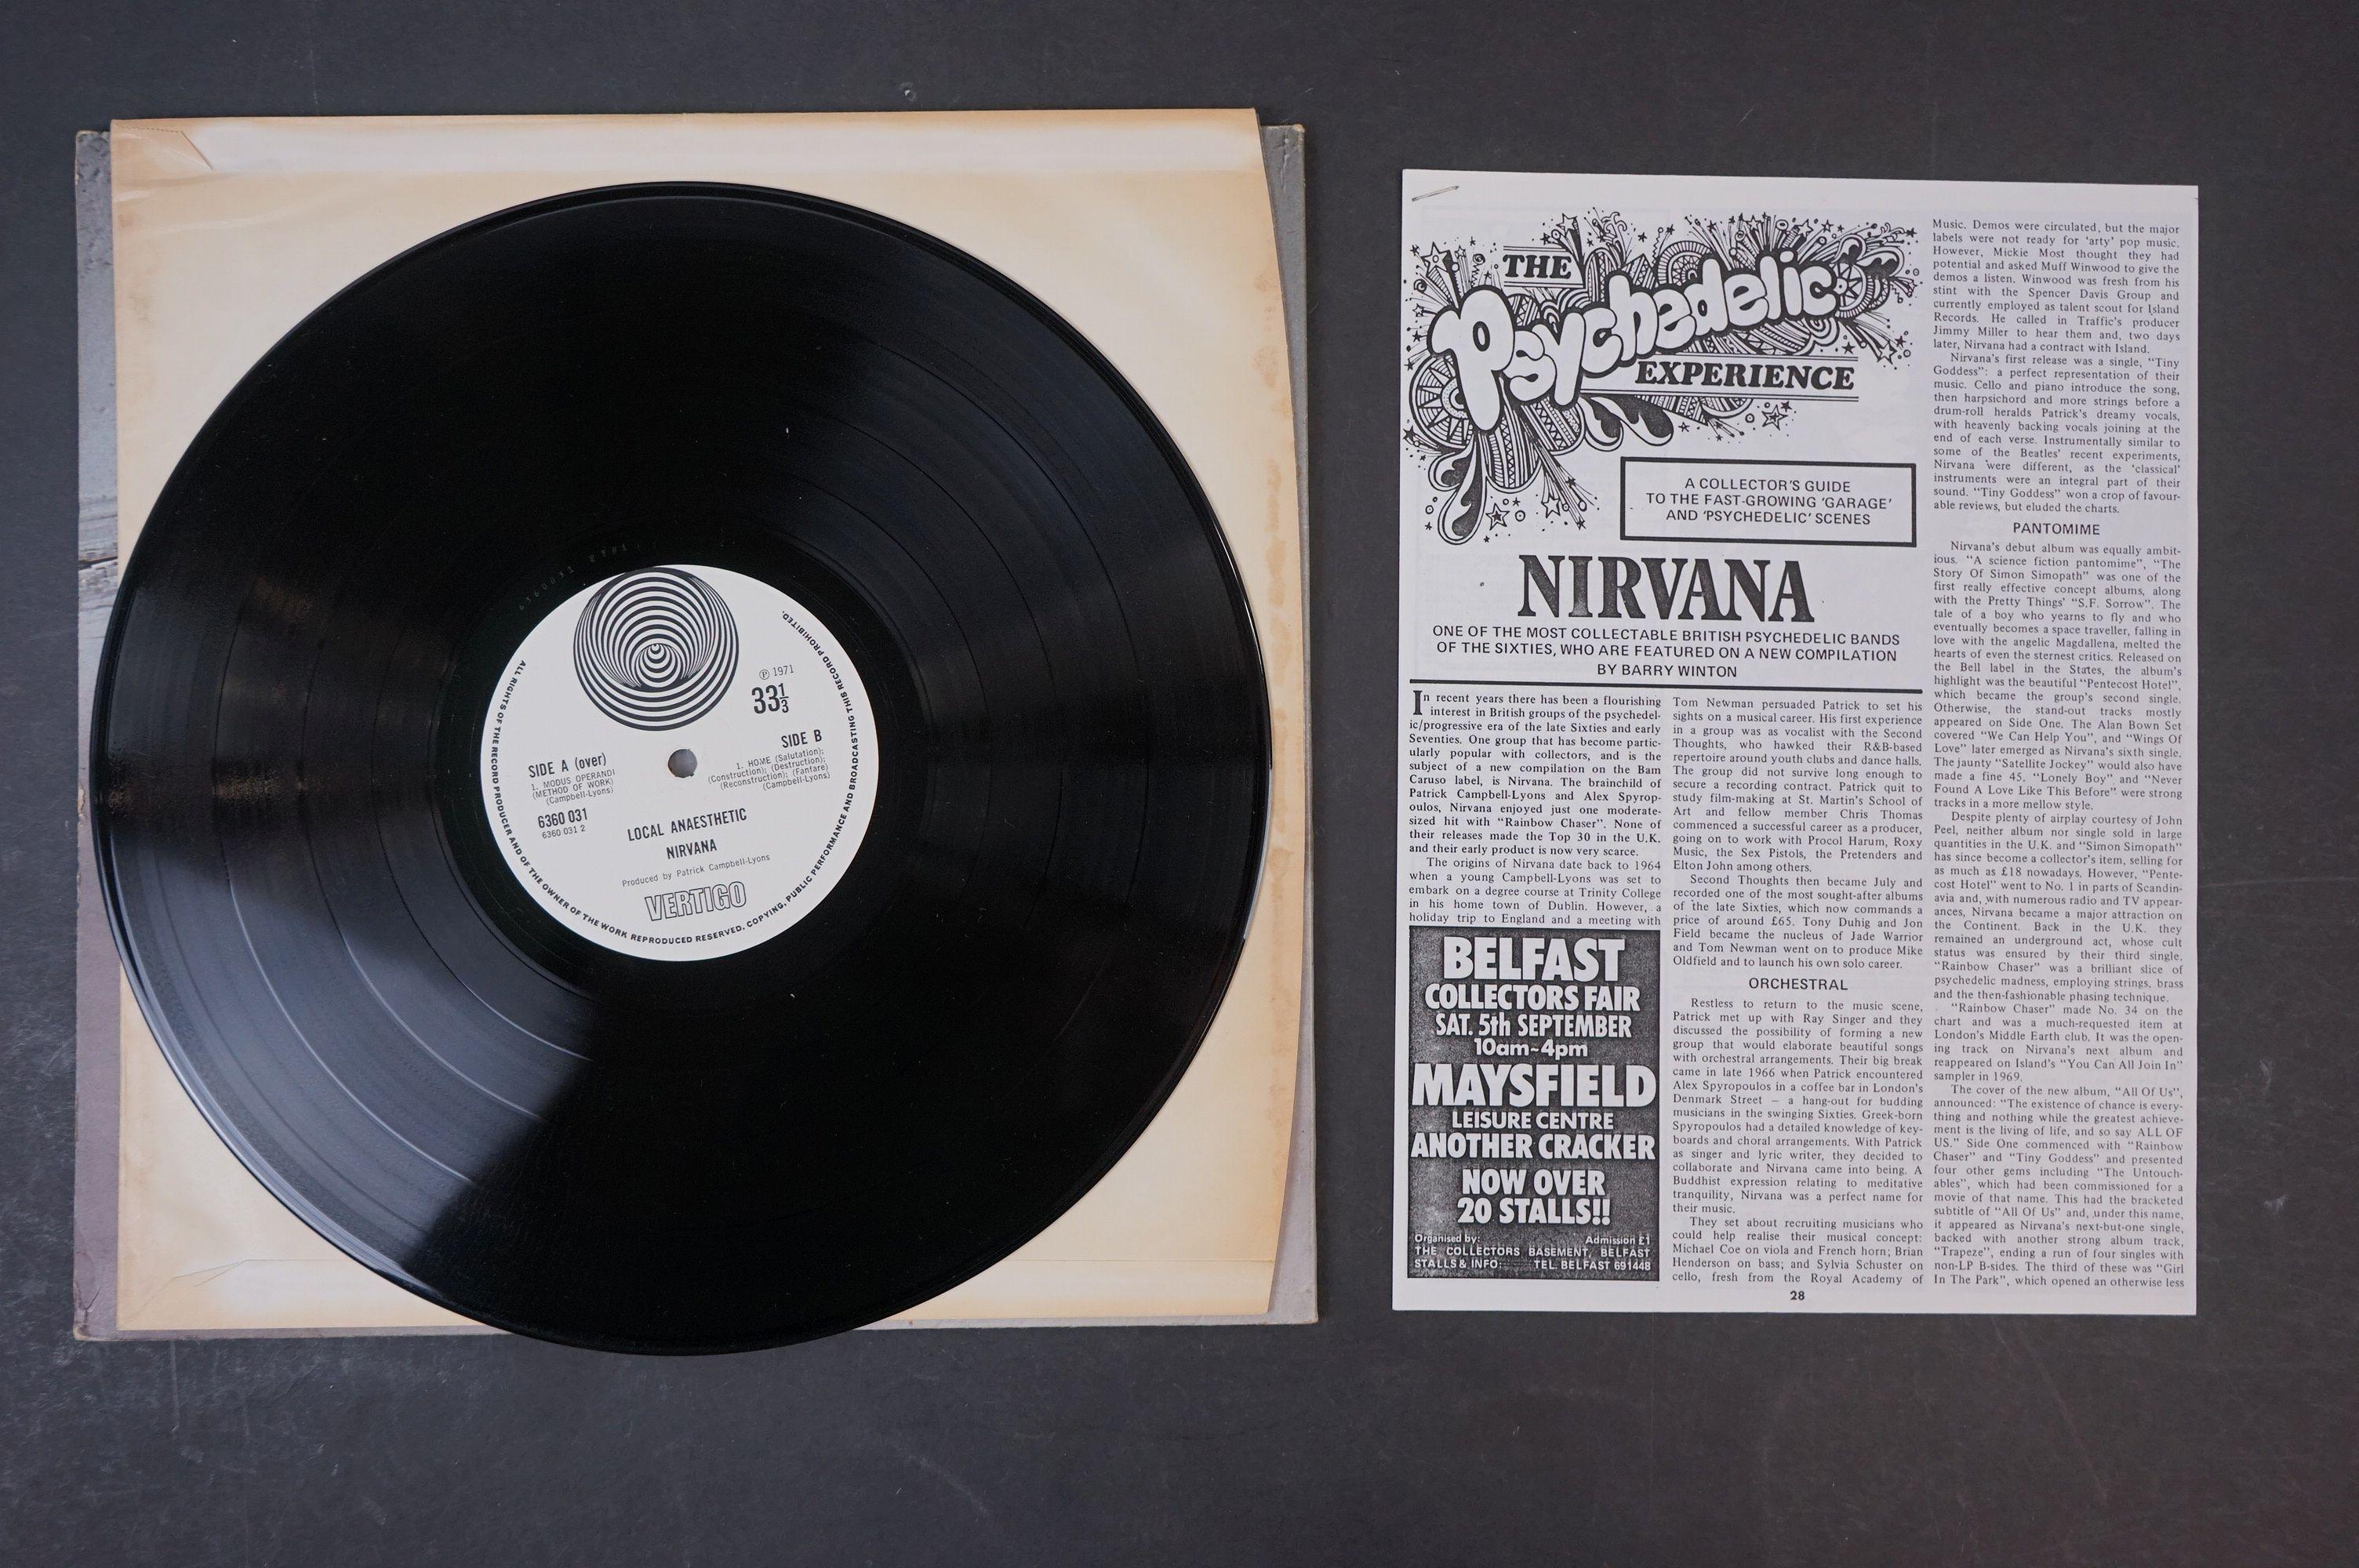 Vinyl - Nirvana Local Anaesthetic LP on Vertigo VO 6360031 gatefold sleeve, swirl logo, swirl - Image 5 of 8